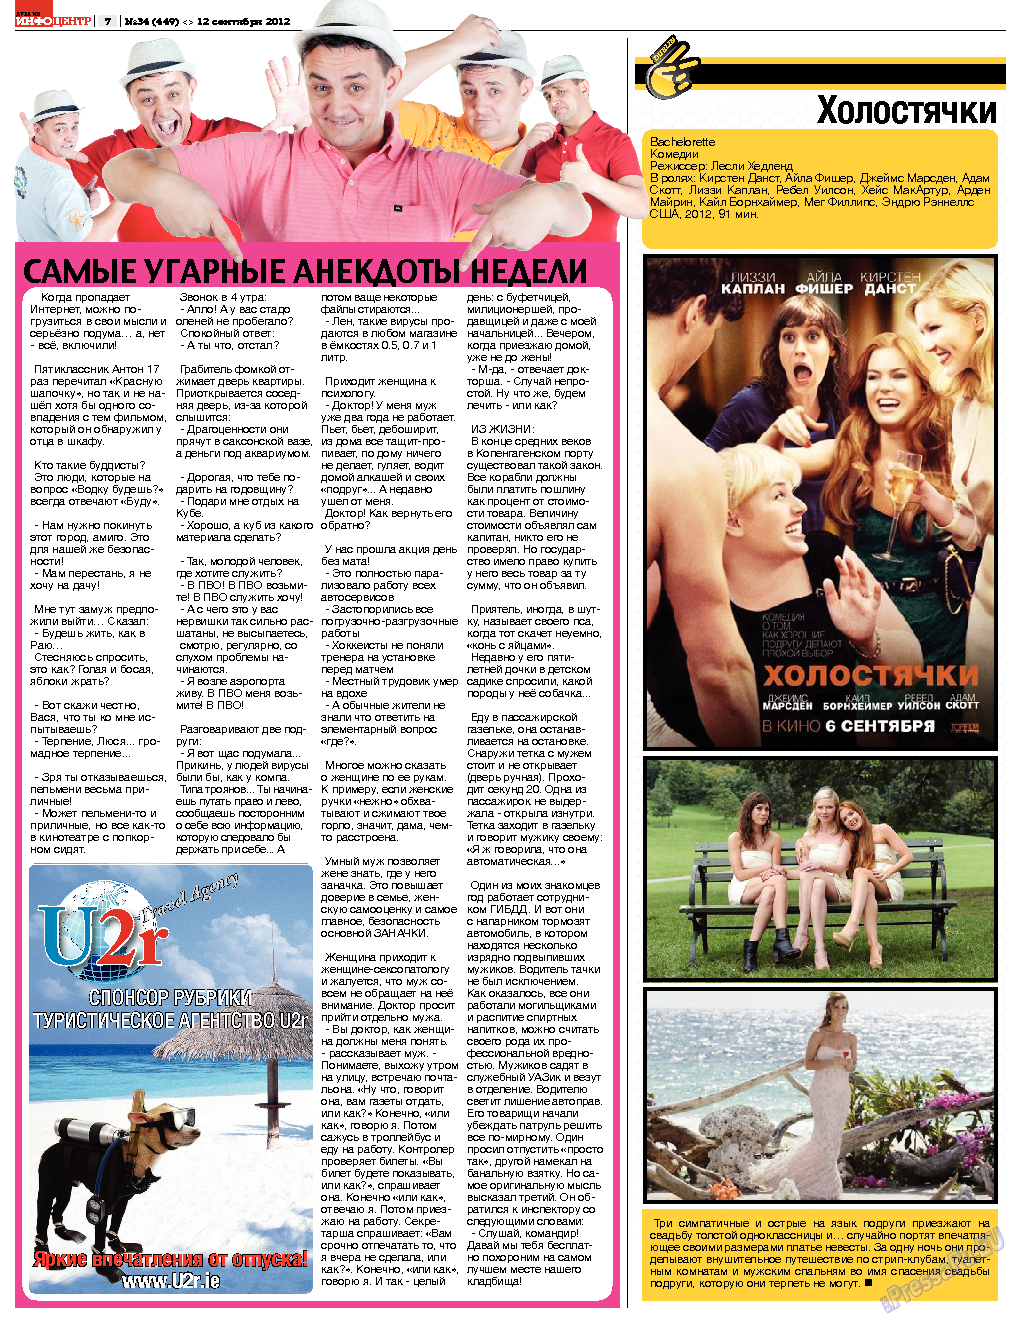 Дублин инфоцентр (газета). 2012 год, номер 34, стр. 7